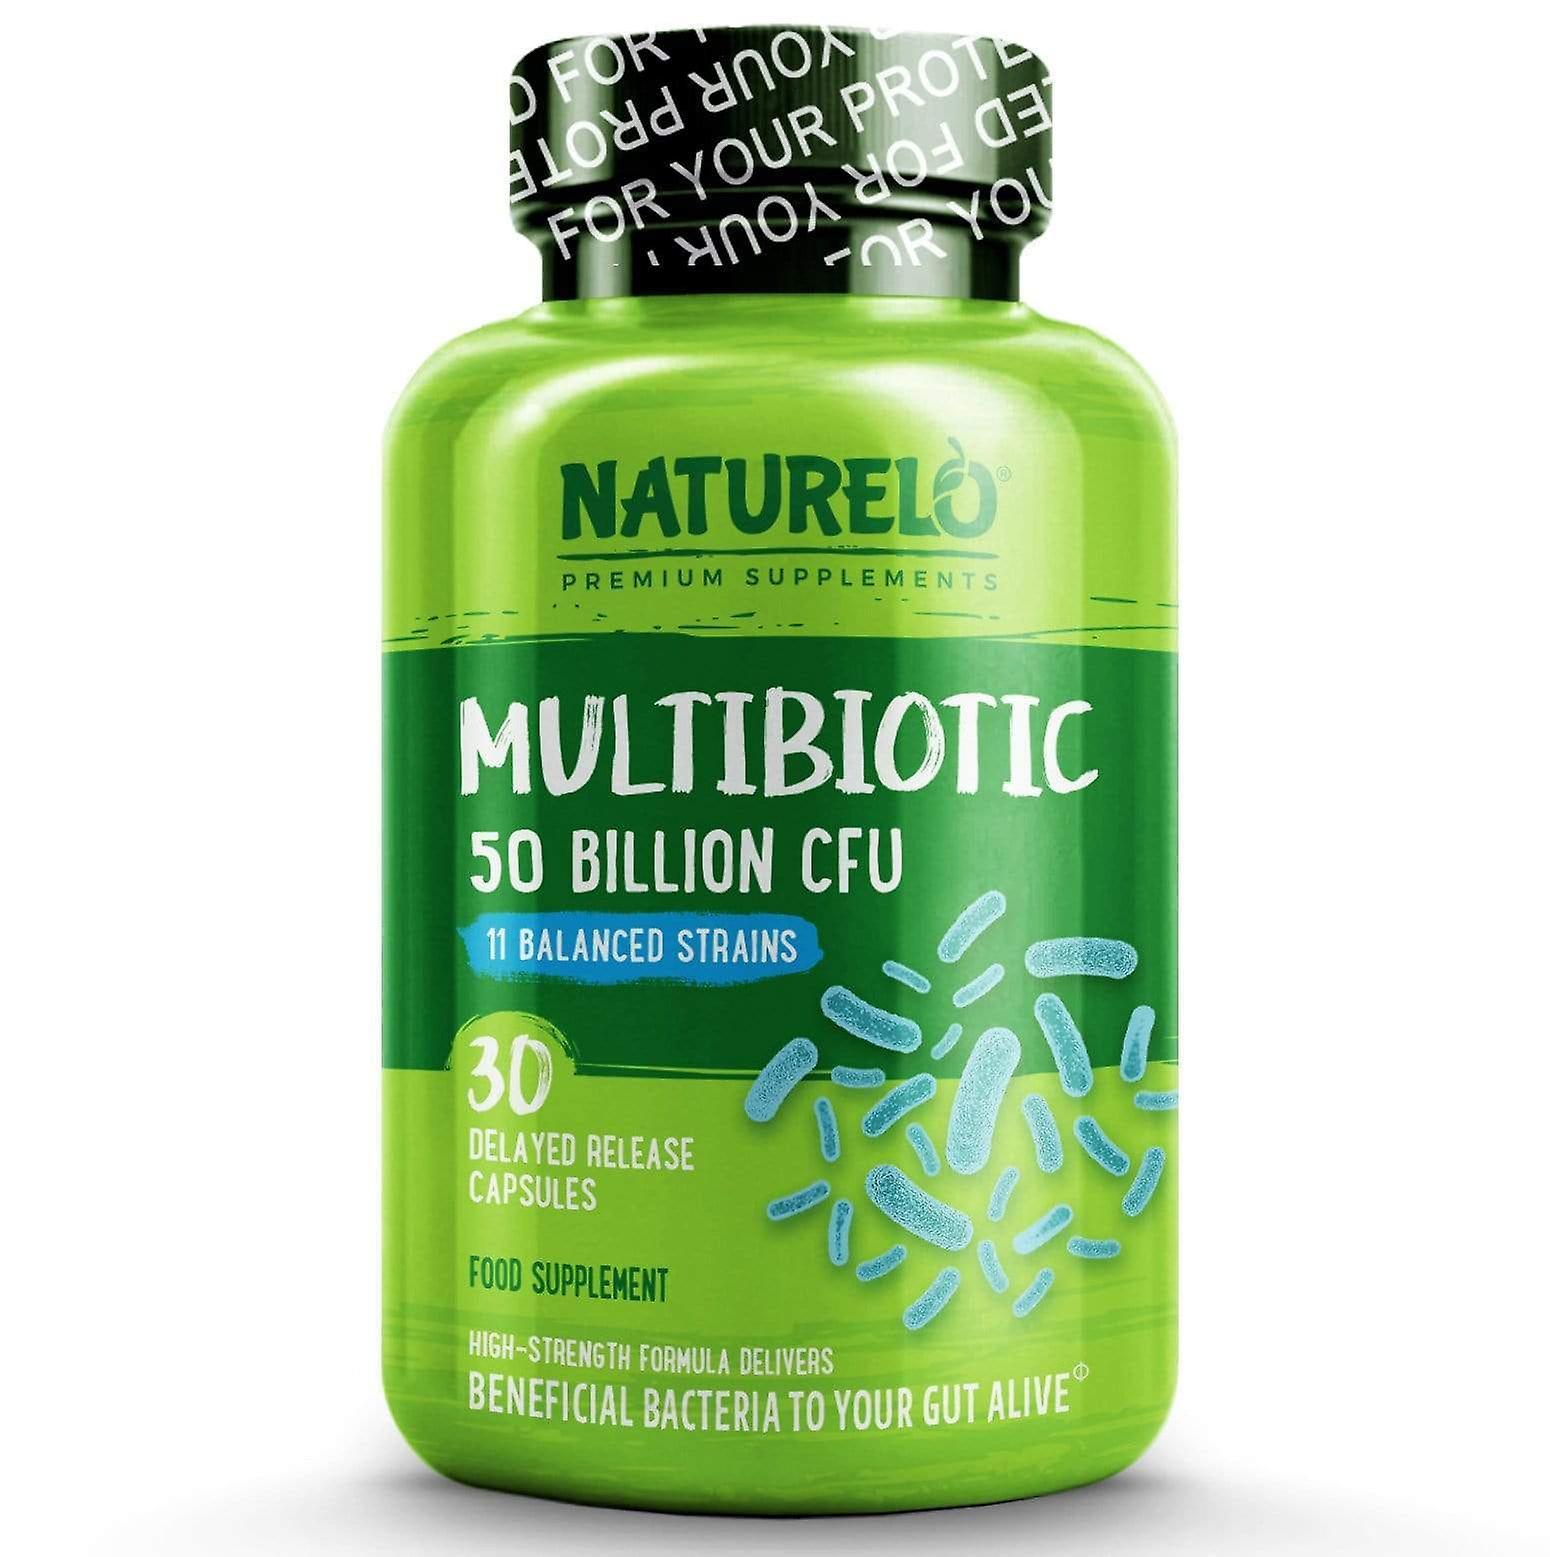 Multibiotic - 50 billion cfu, 11 balanced strains, no refrigeration needed